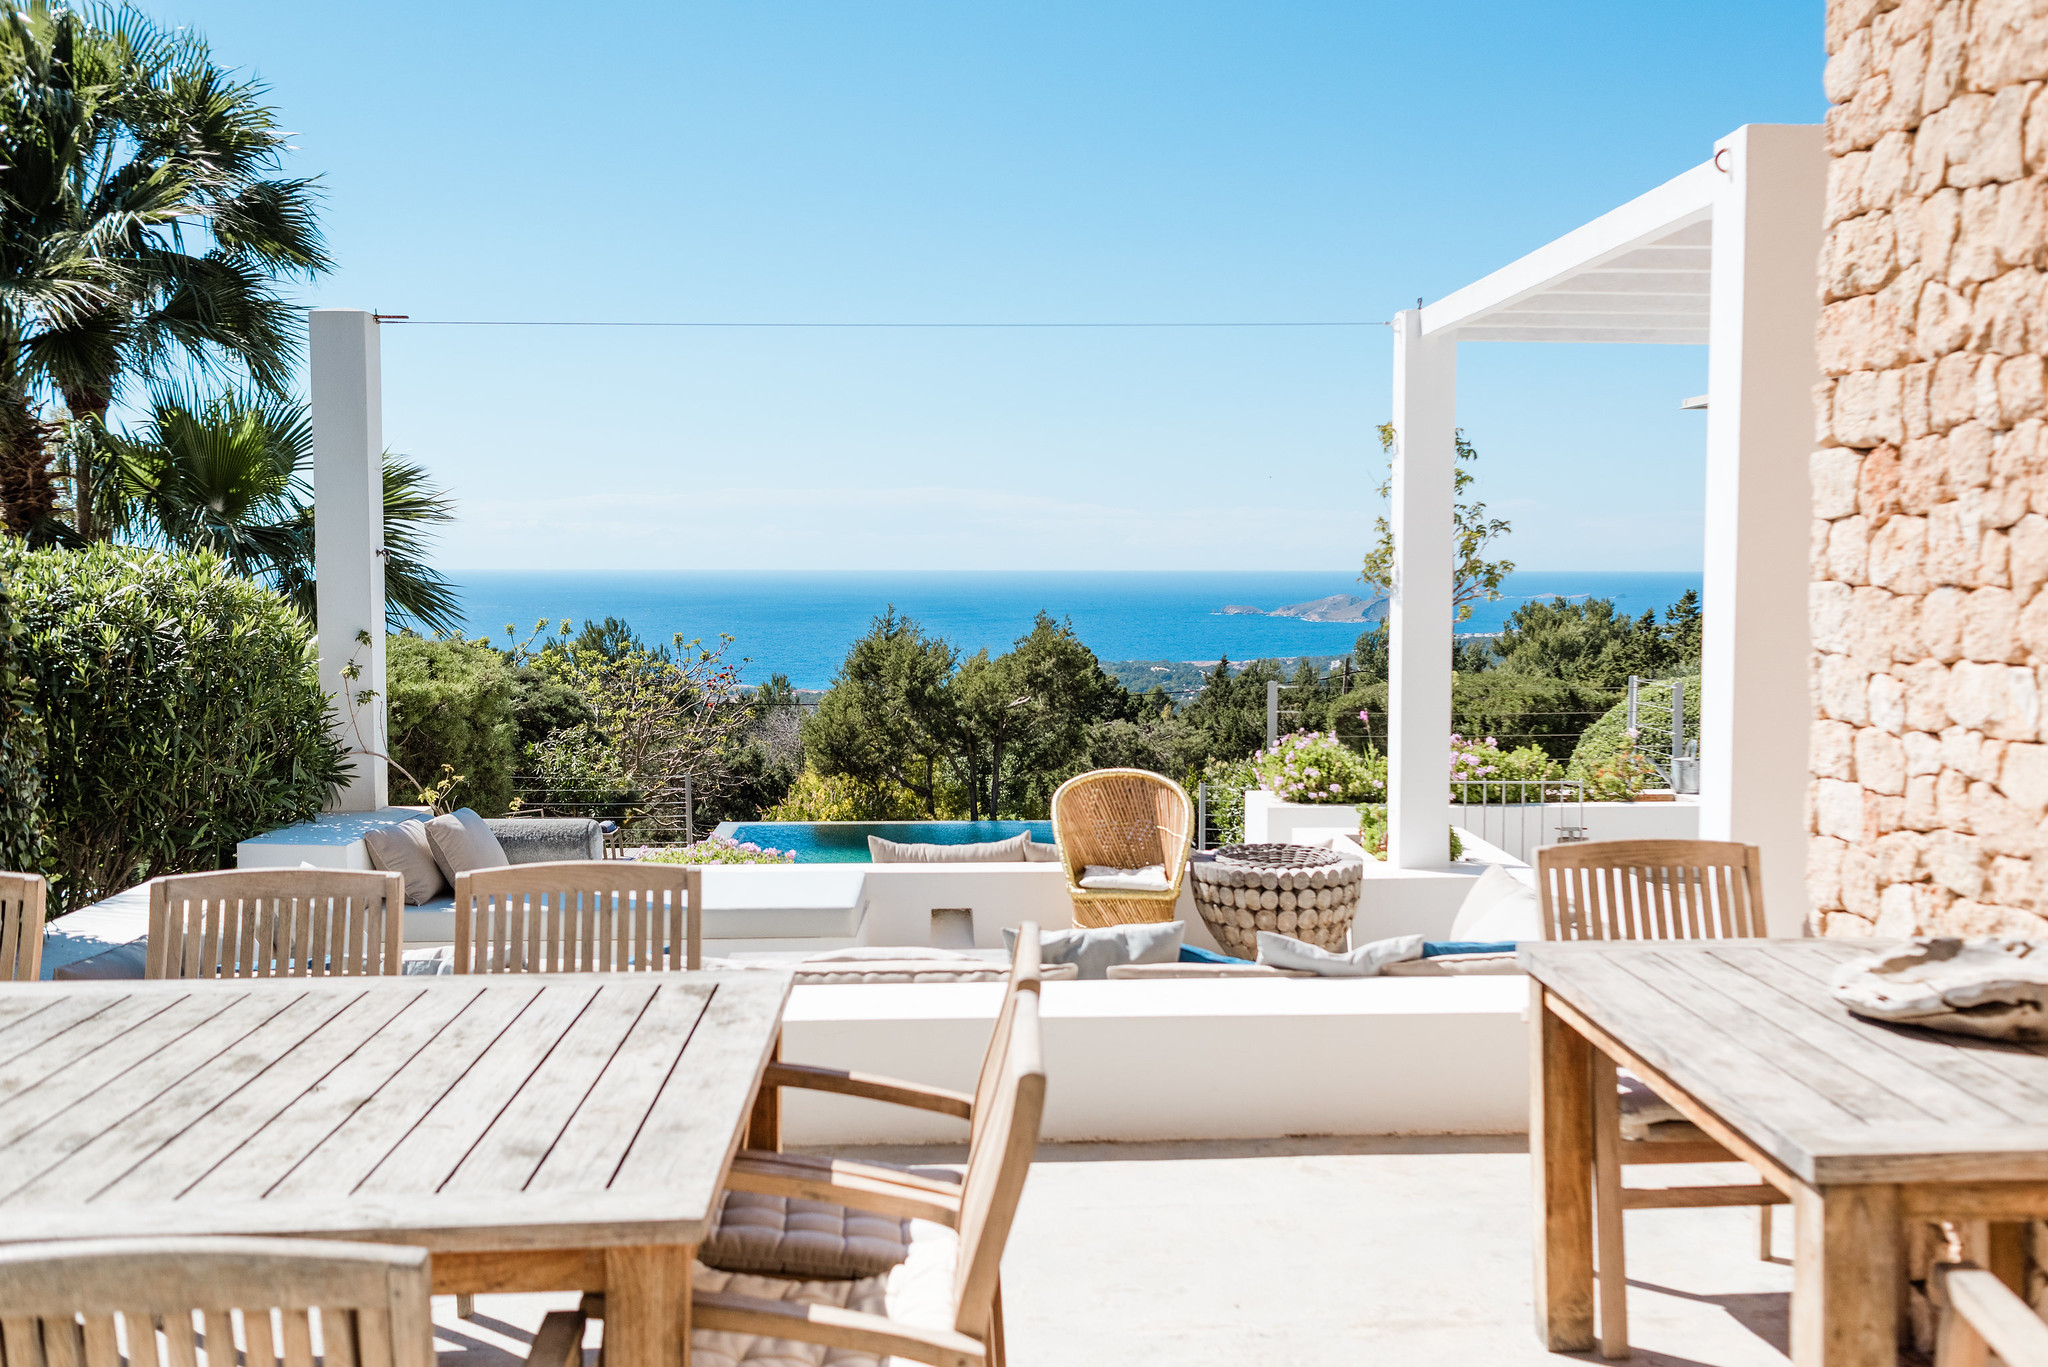 https://www.white-ibiza.com/wp-content/uploads/2020/06/white-ibiza-villas-casa-nyah-exterior-terrace-view2.jpg